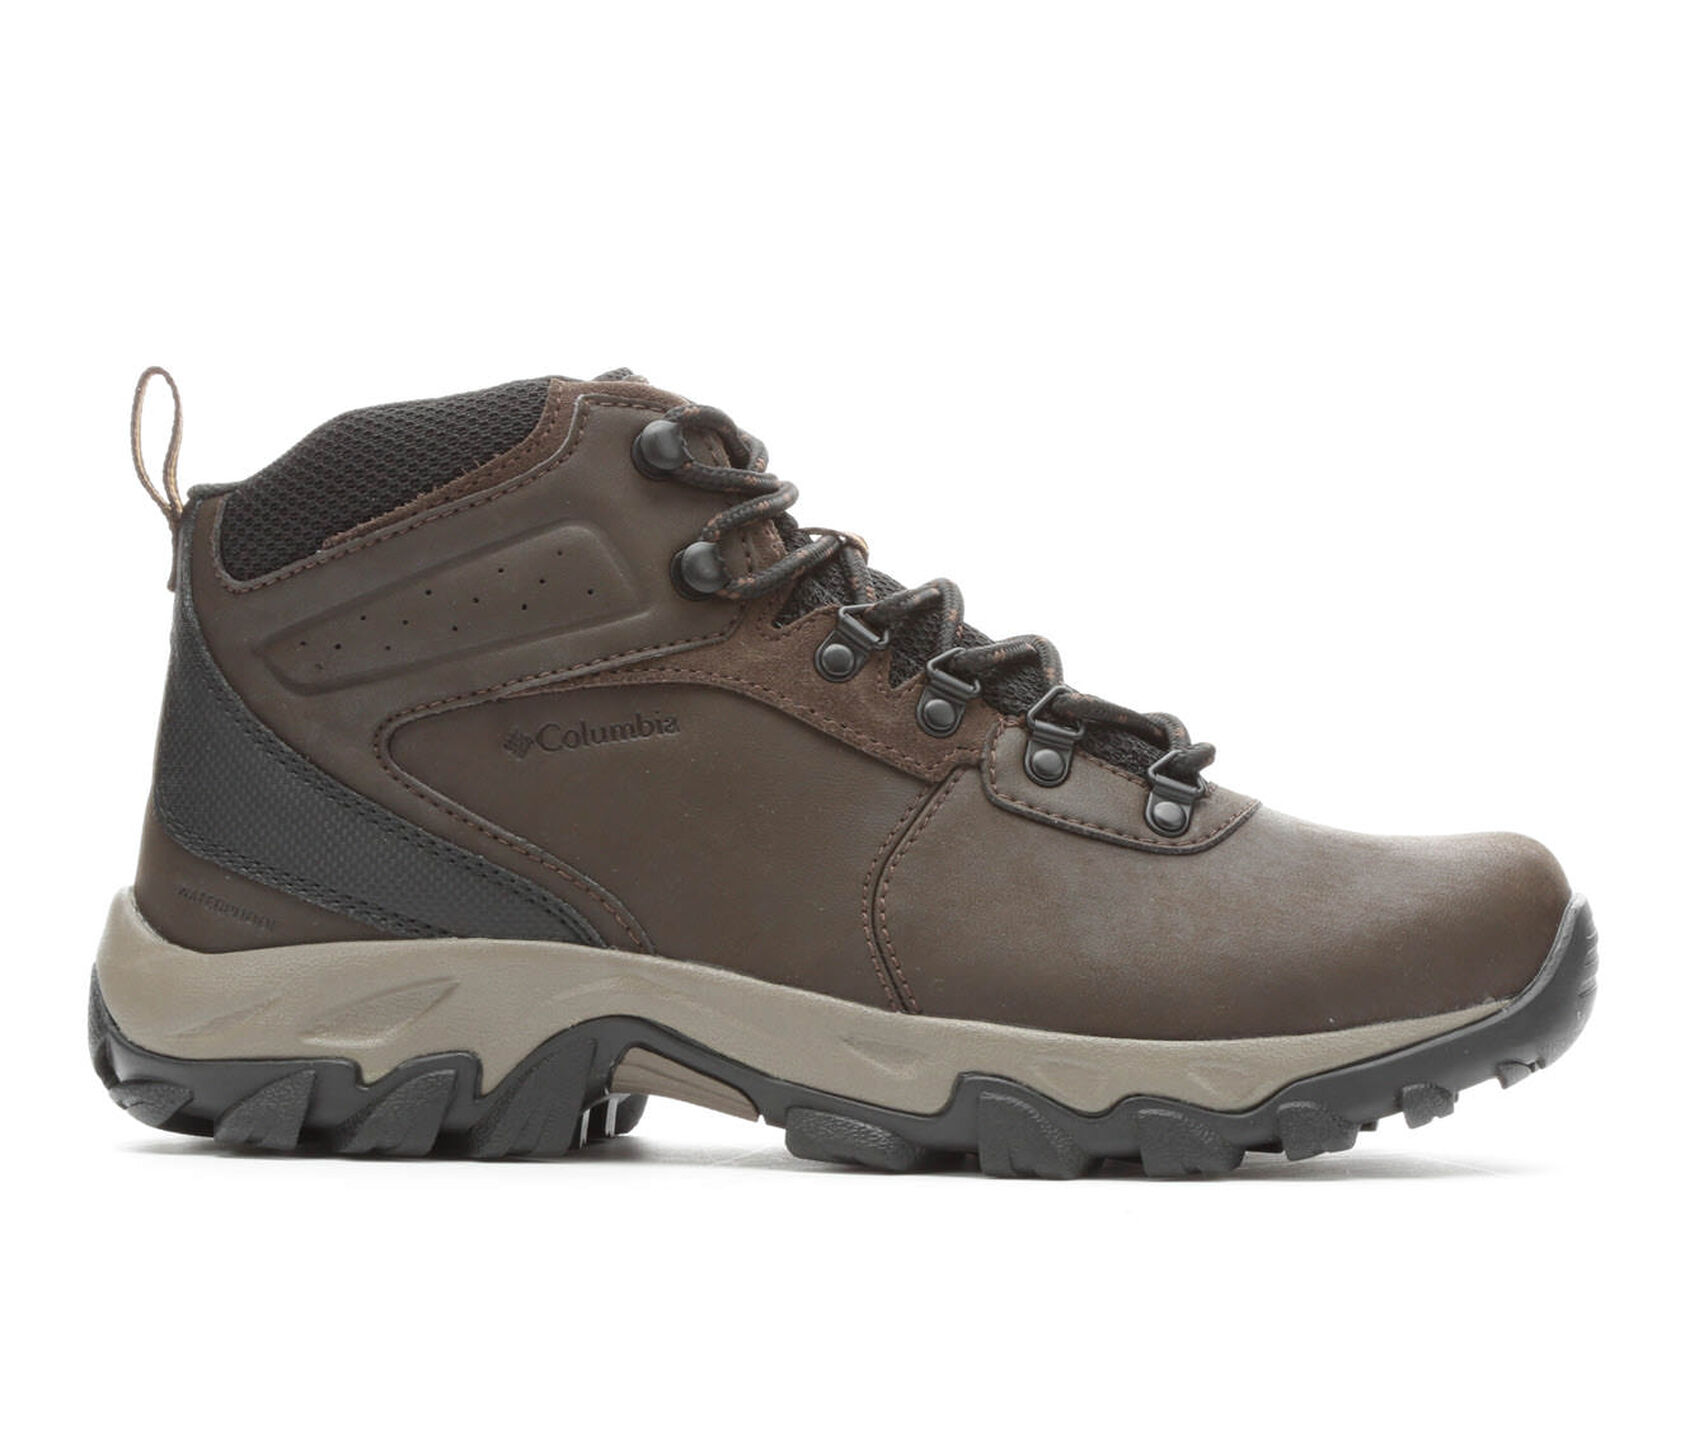 43a5179a042 Men's Columbia Newton Ridge Plus II Waterproof Hiking Boots